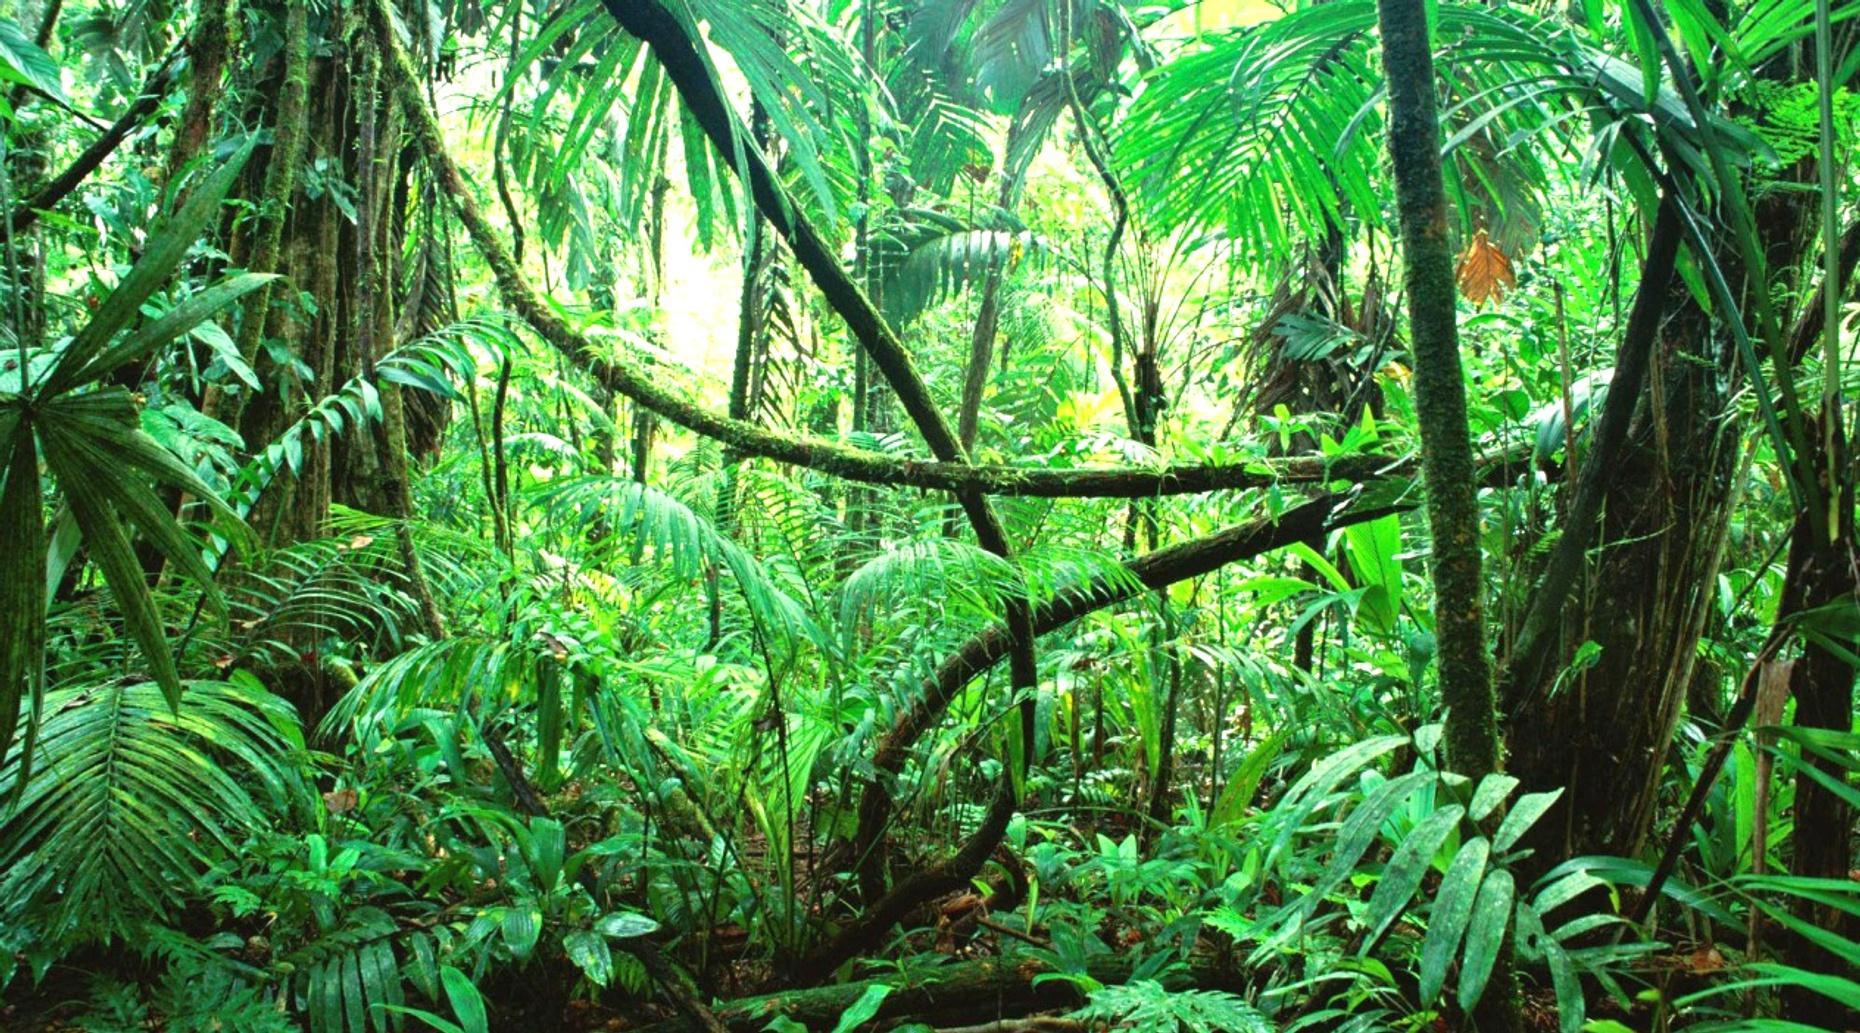 Ancient Mayan City & Calakmul Biosphere Tour in Campeche